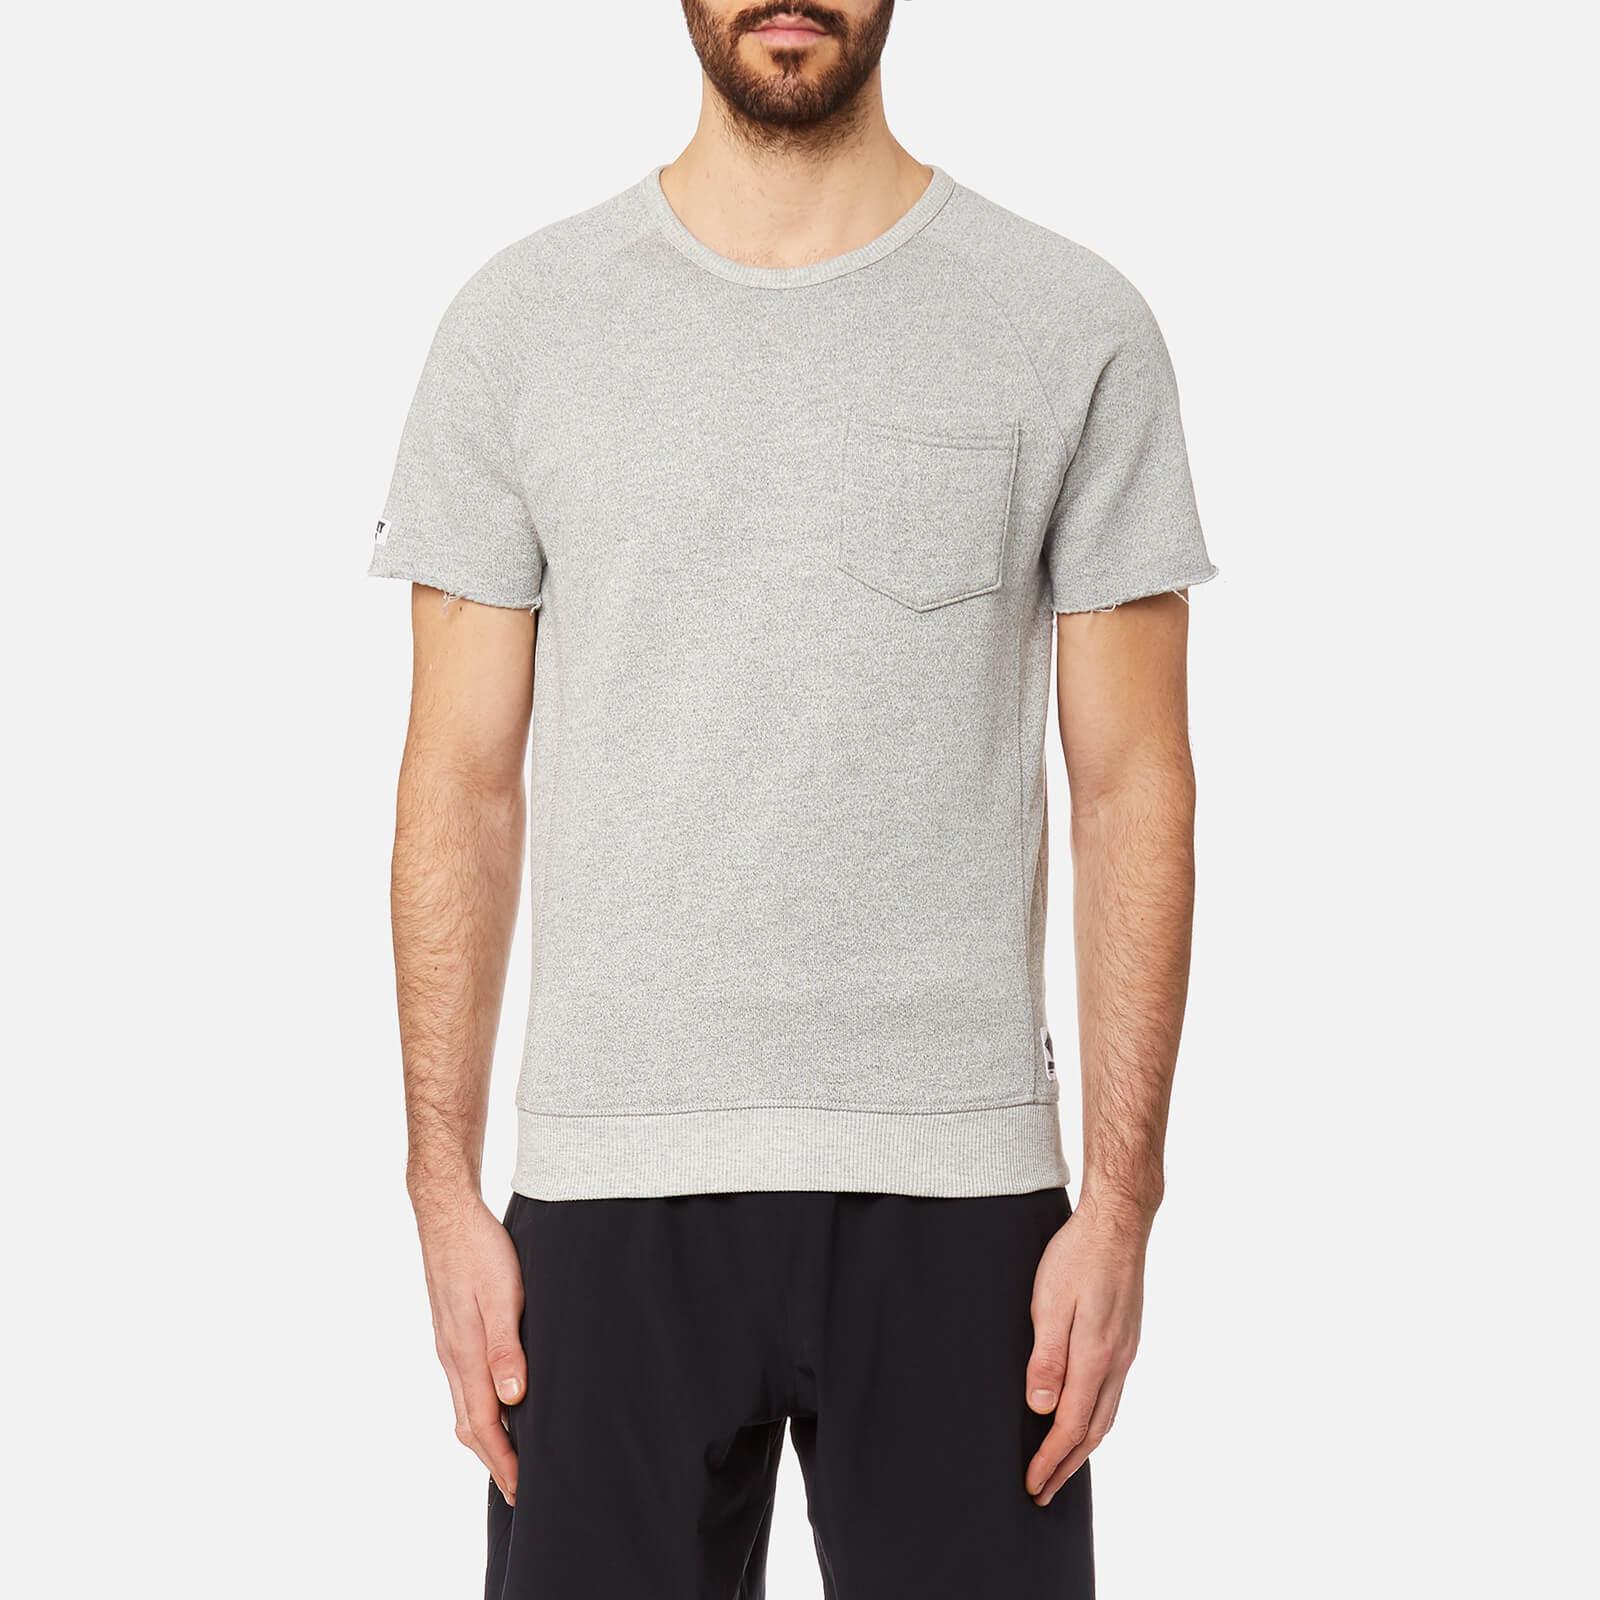 Superdry Men's Sport Gym Locked Short Sleeve Sweatshirt - Gym Grey Grit - L - Grey